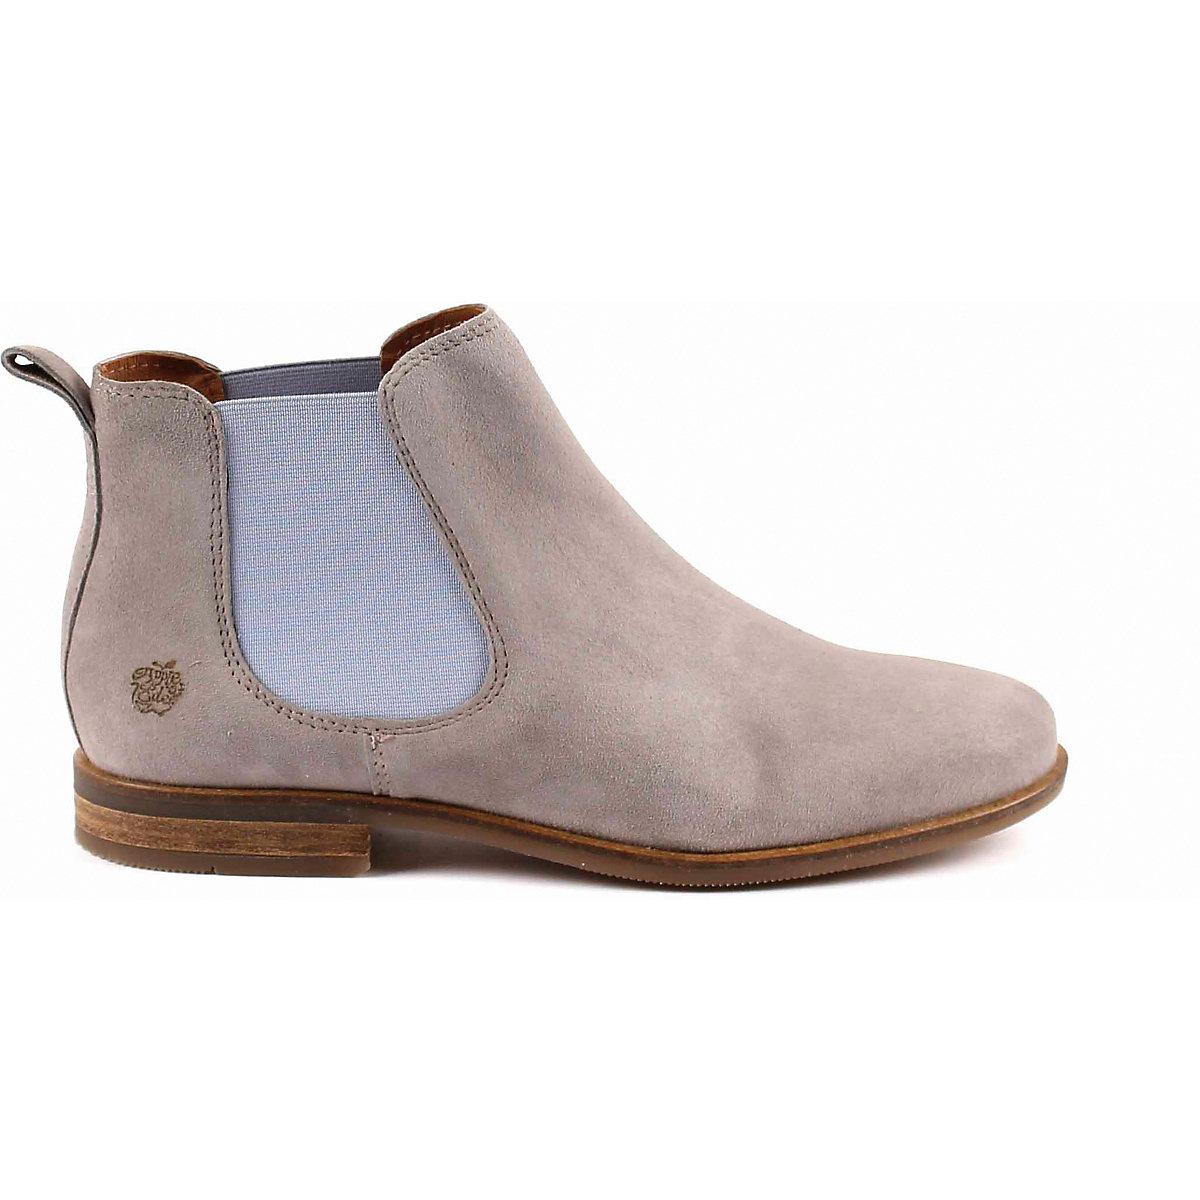 Apple Of Eden, Manon Chelsea Boots, Grau